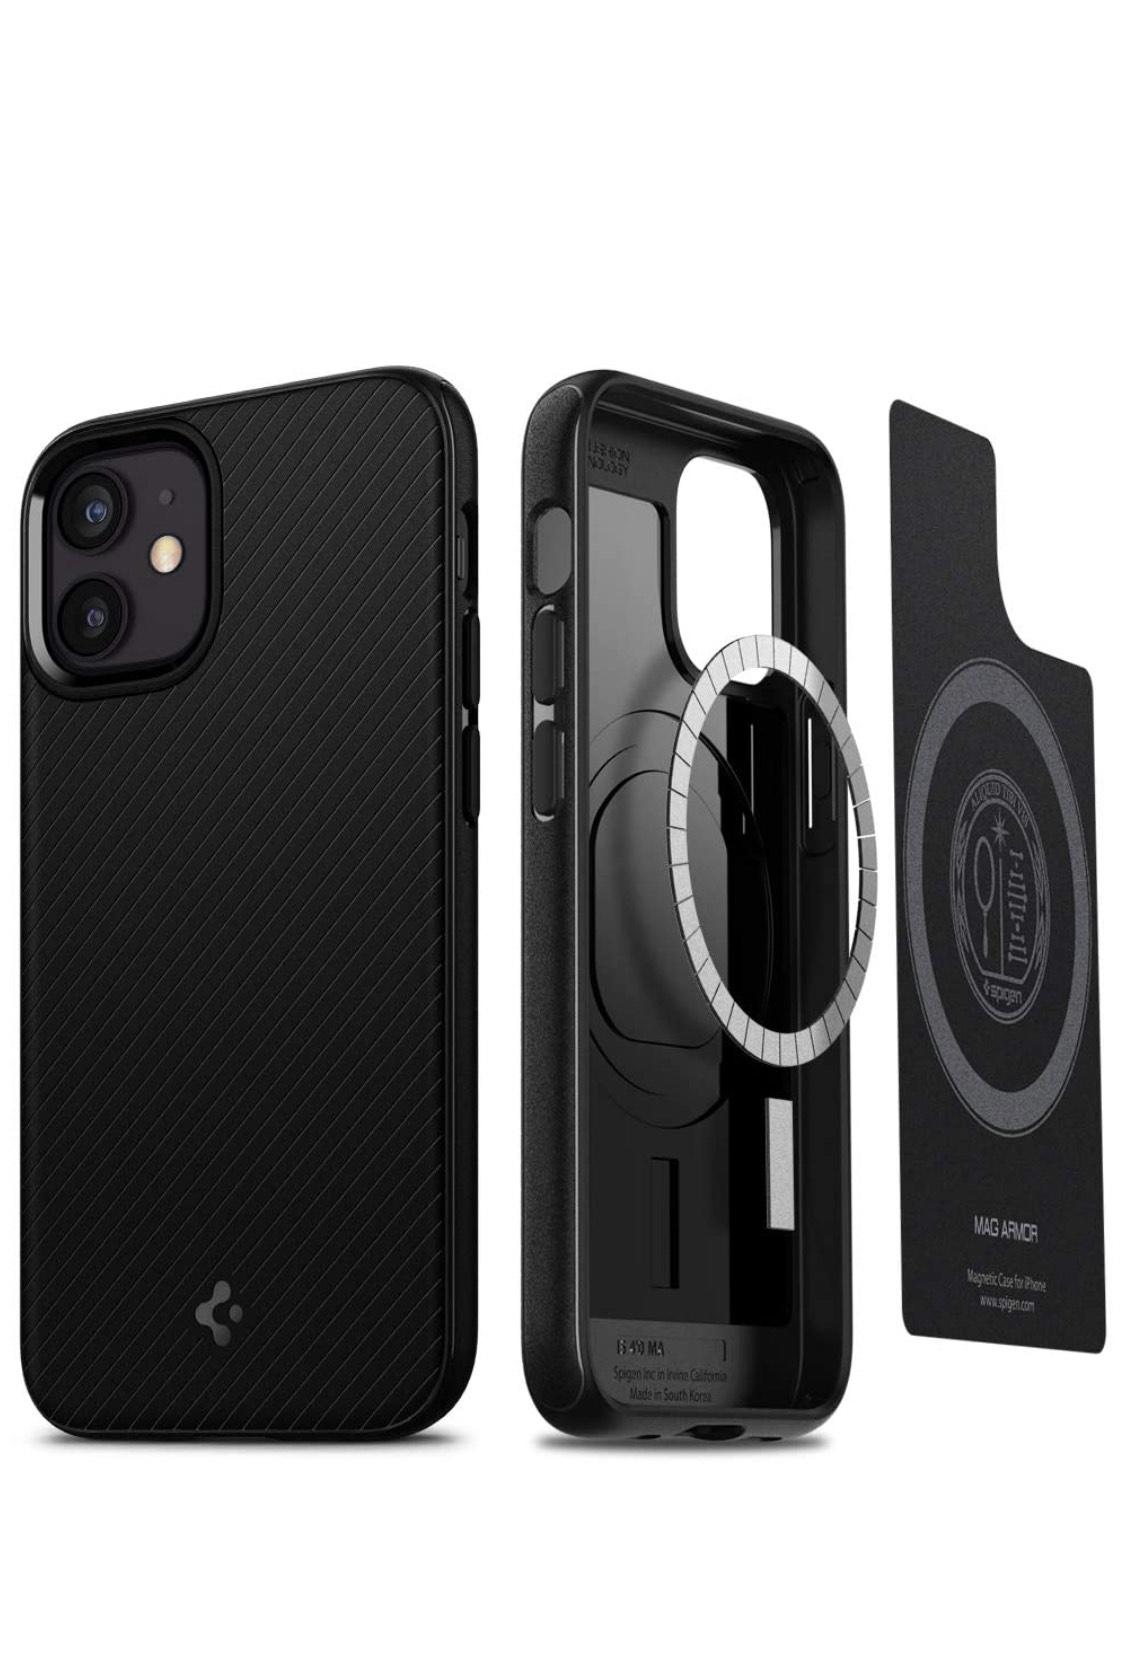 Iphone 12 Mini Spigen Mag Armor MagSafe